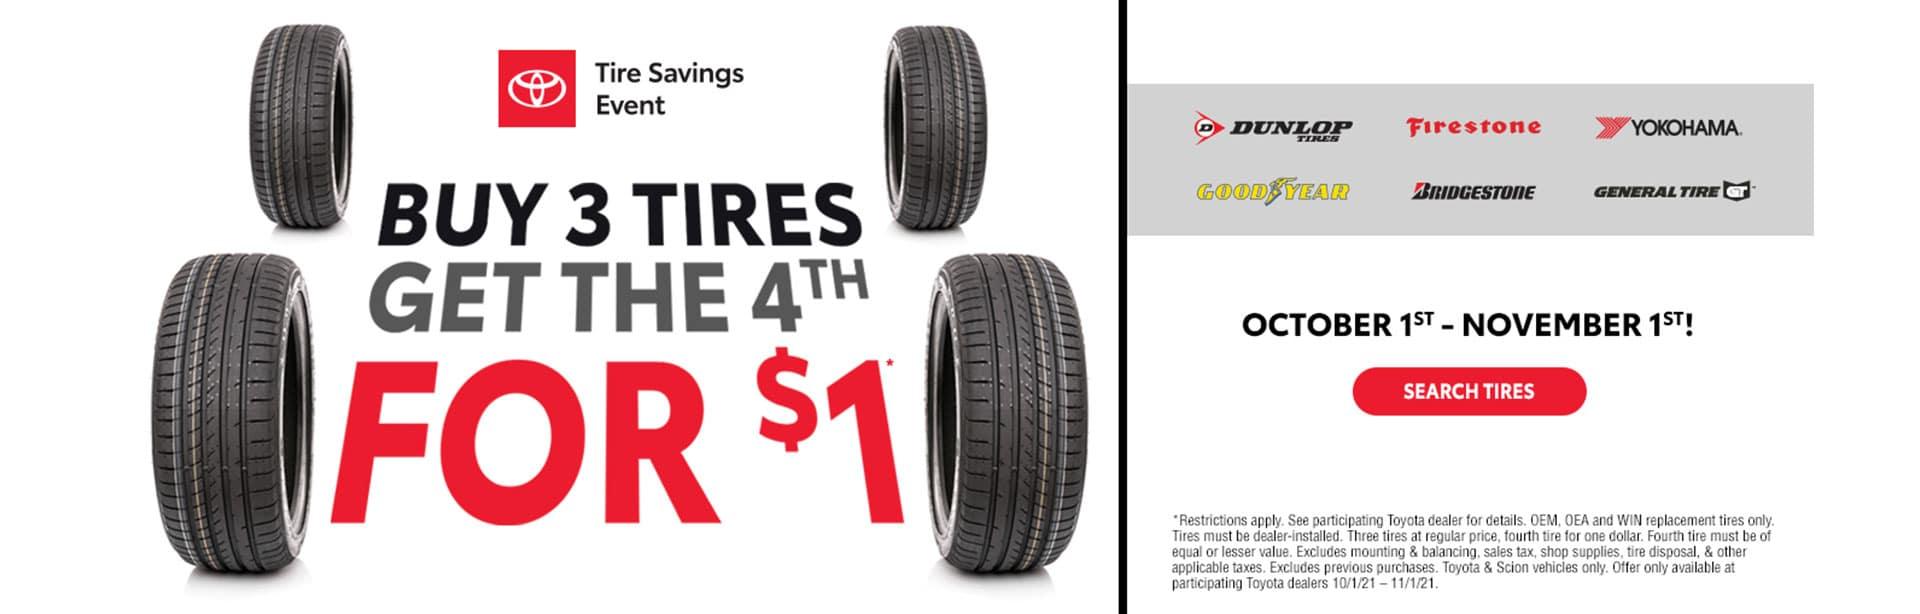 BSTO90088-01-September-2021-Toyota-Tire-Sale-Slide-english